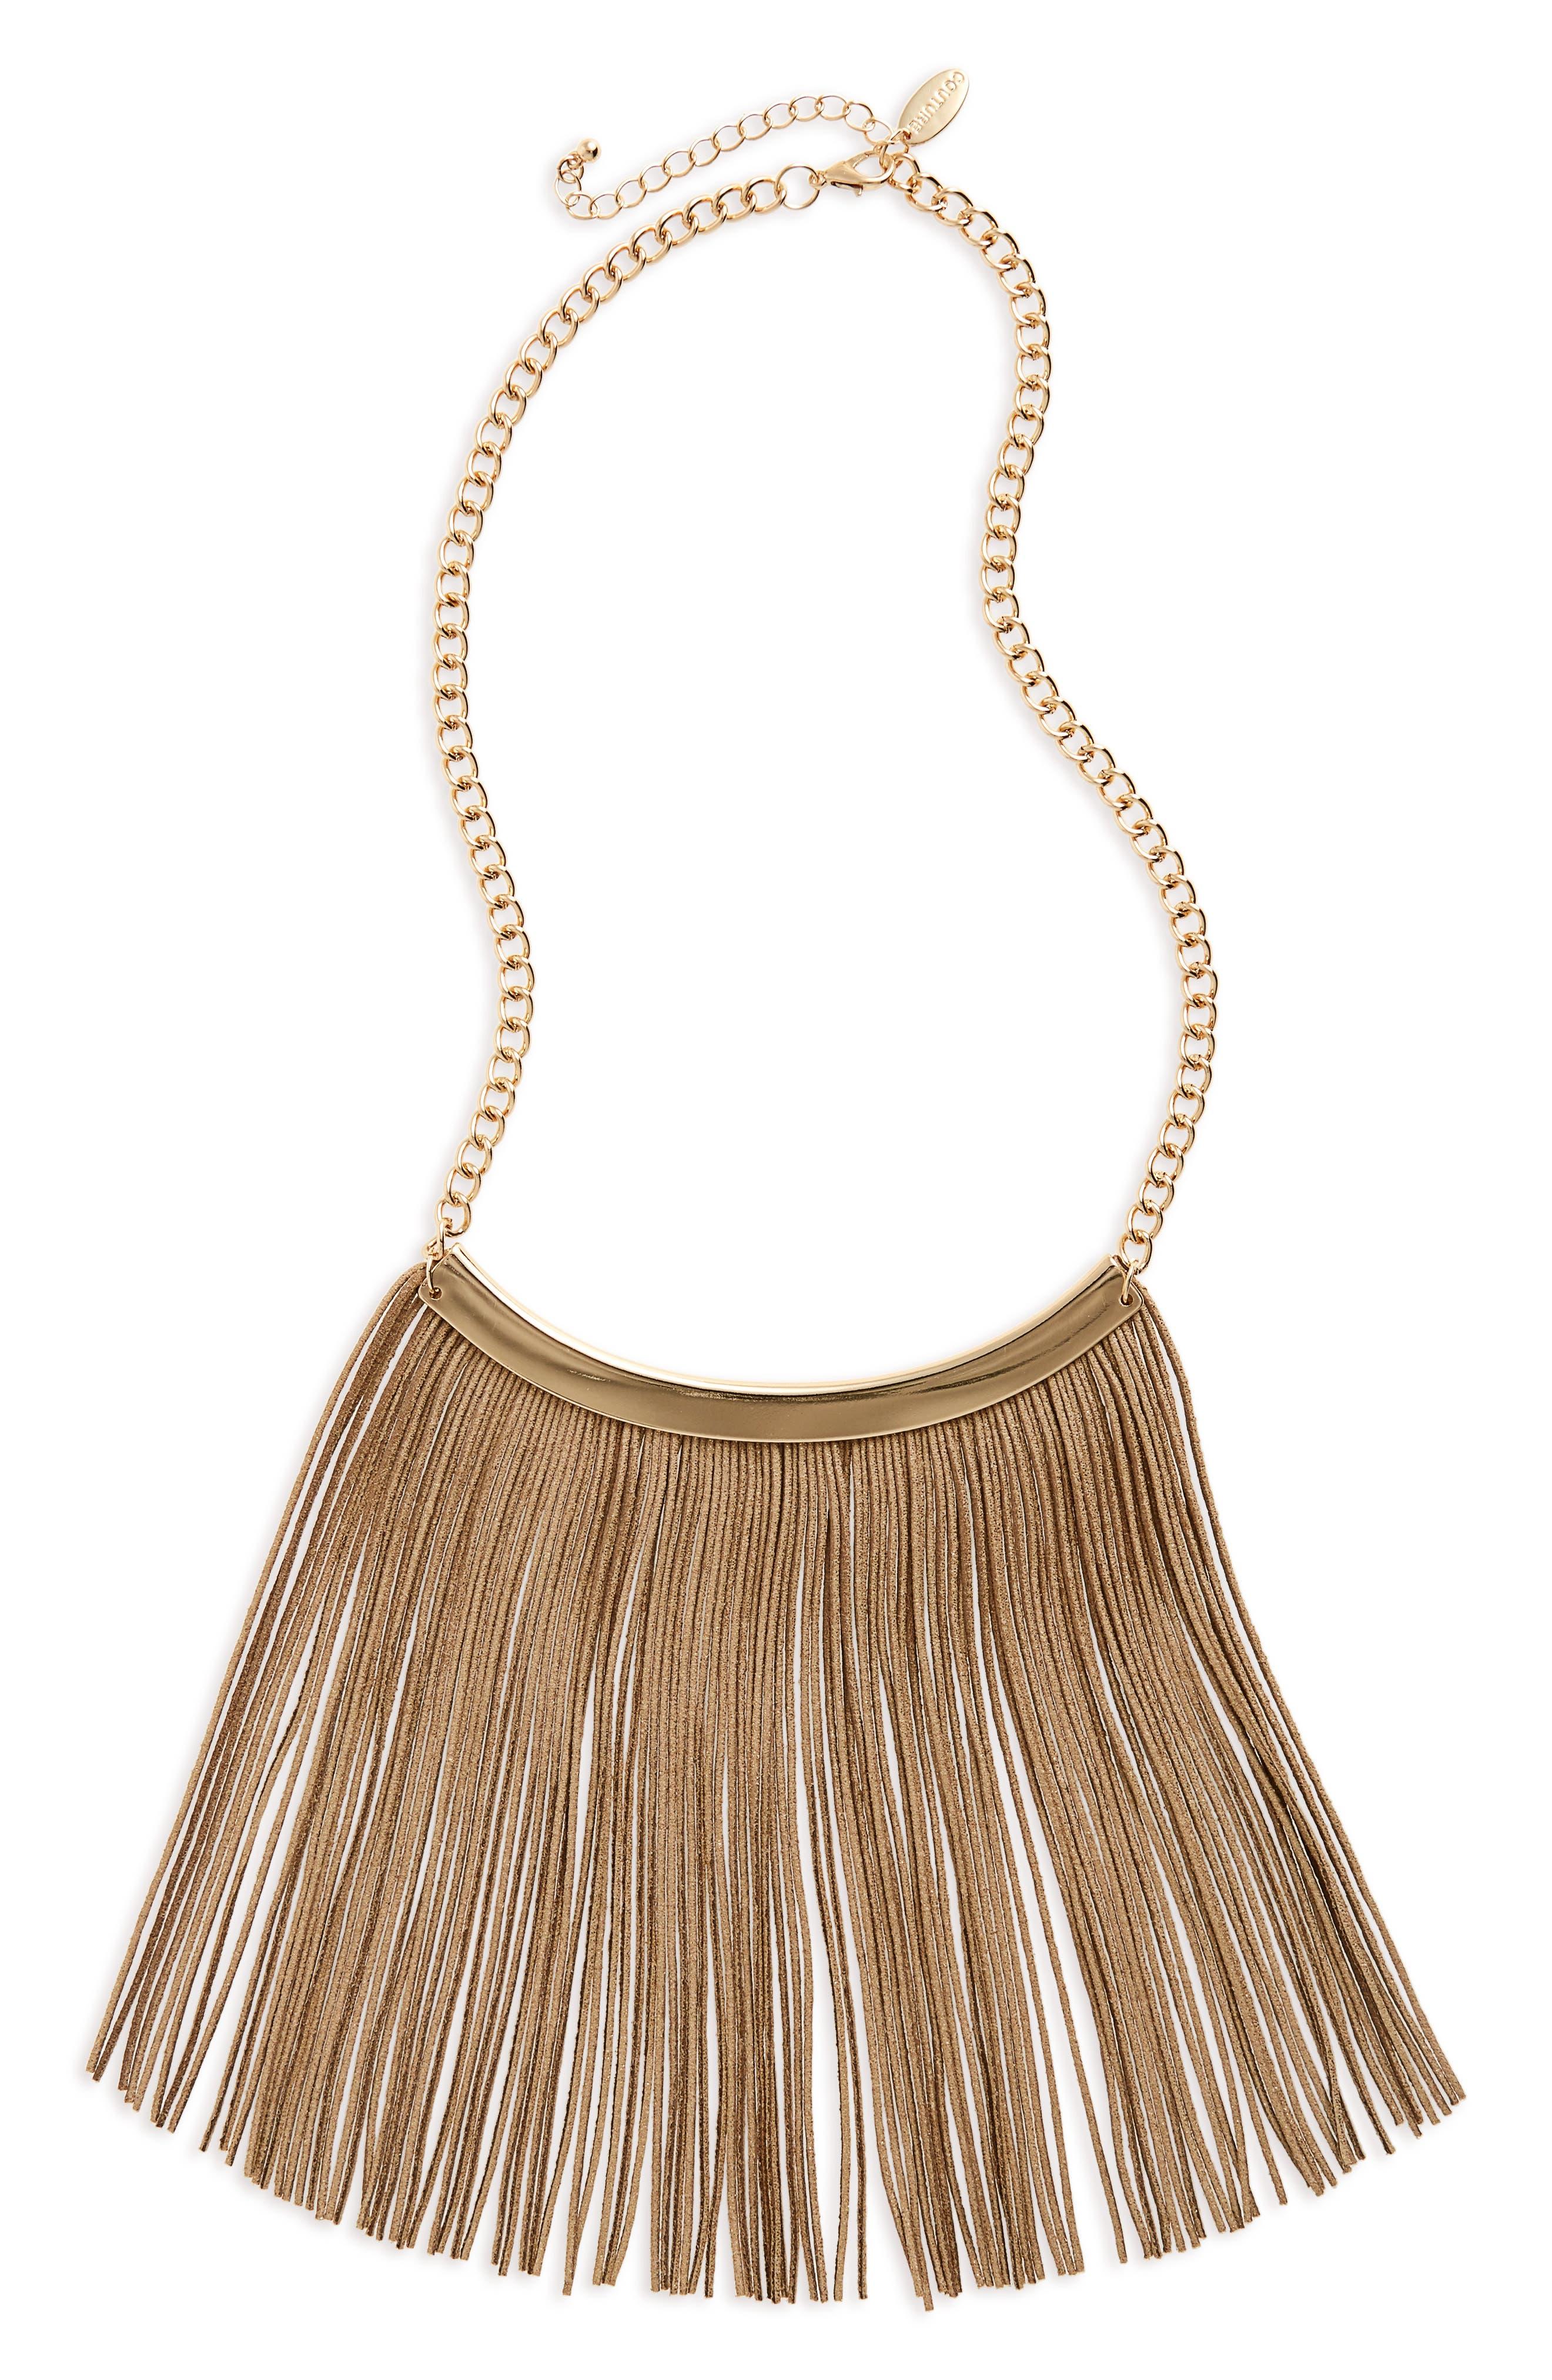 Main Image - Natasha Couture Liquid Fringe Bib Necklace